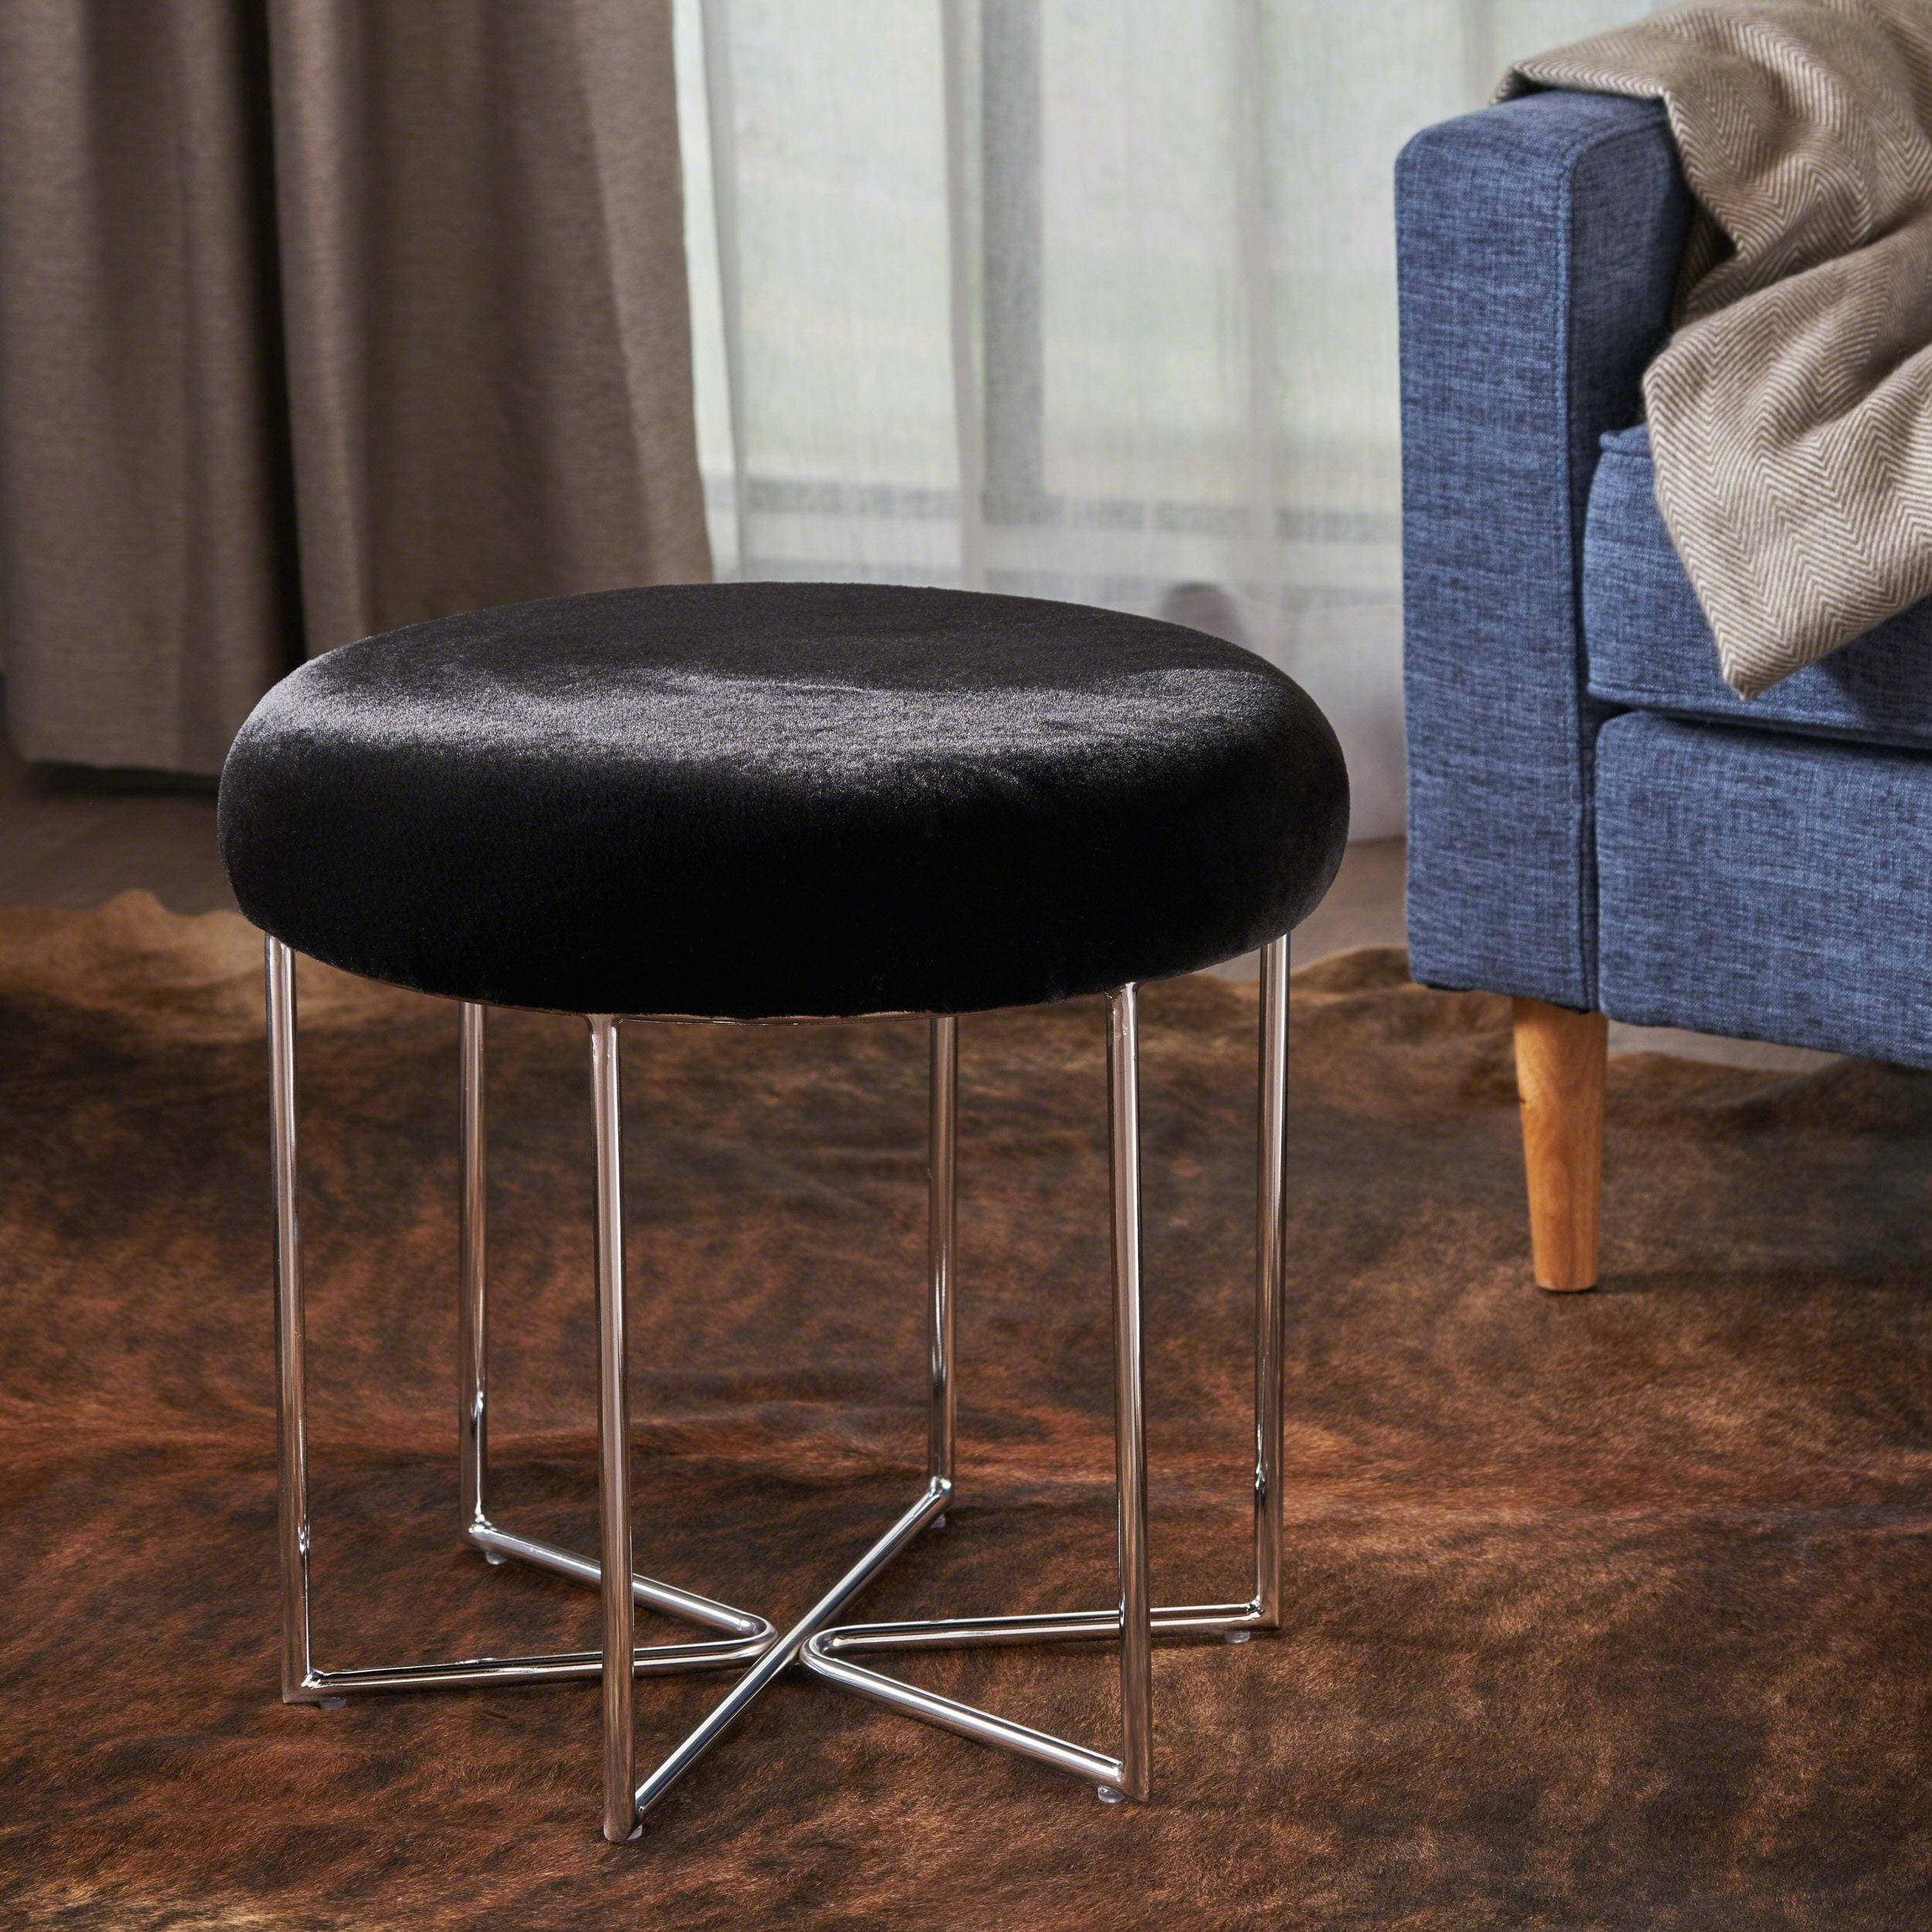 Terrific Aveline Glam Furry Fabric Round Ottoman Stool By Christopher Knight Home Machost Co Dining Chair Design Ideas Machostcouk